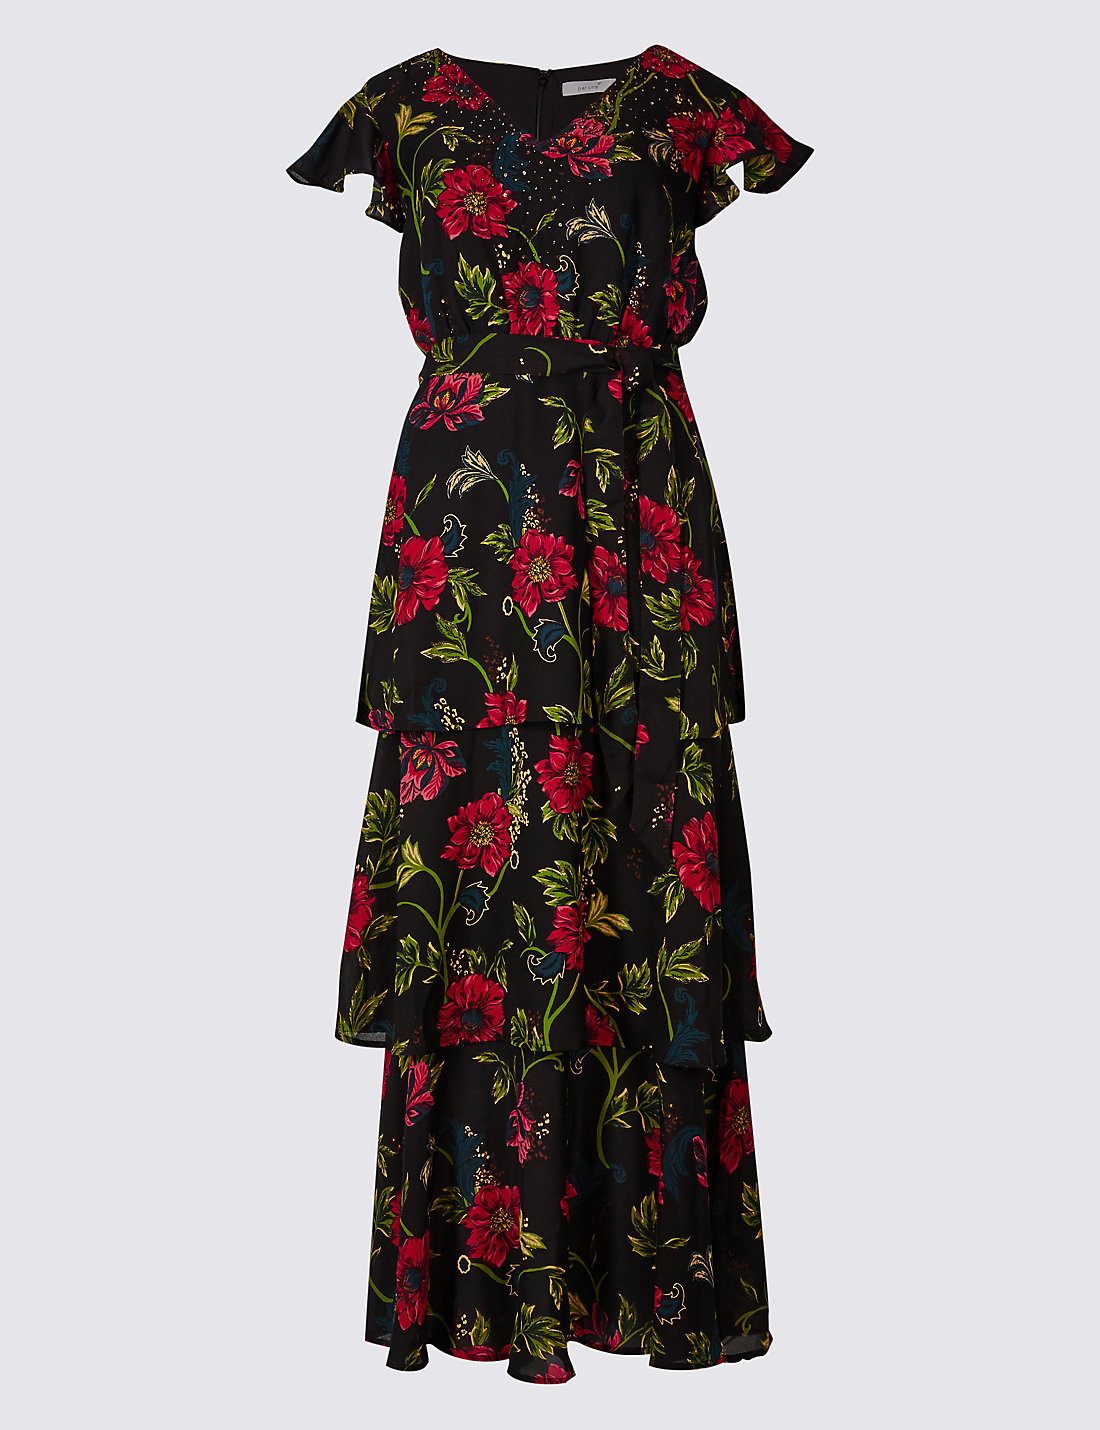 Per Una Black Dress Part - 24: Embellished Floral Print Tiered Maxi Dress · Per Una